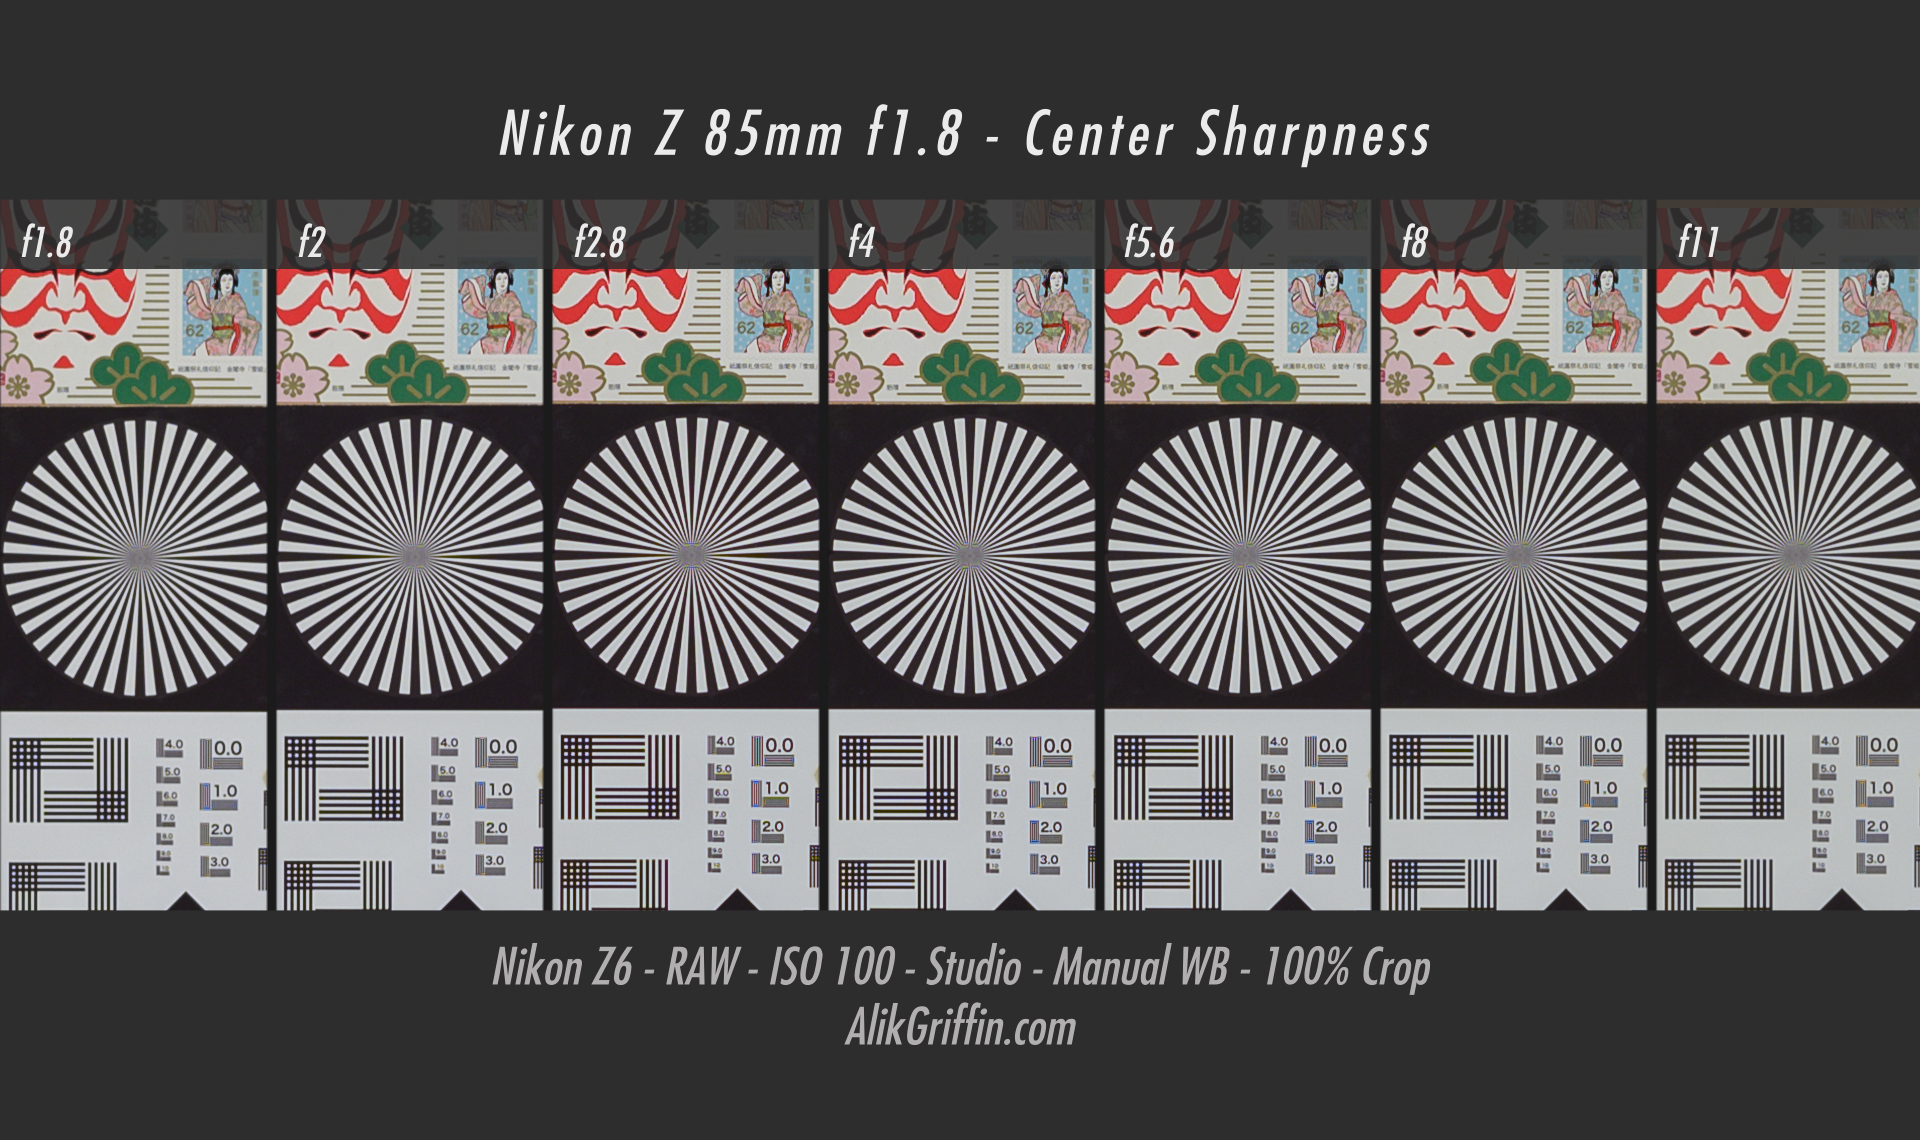 Nikon Z 85mm f1.8 S Center Sharpness